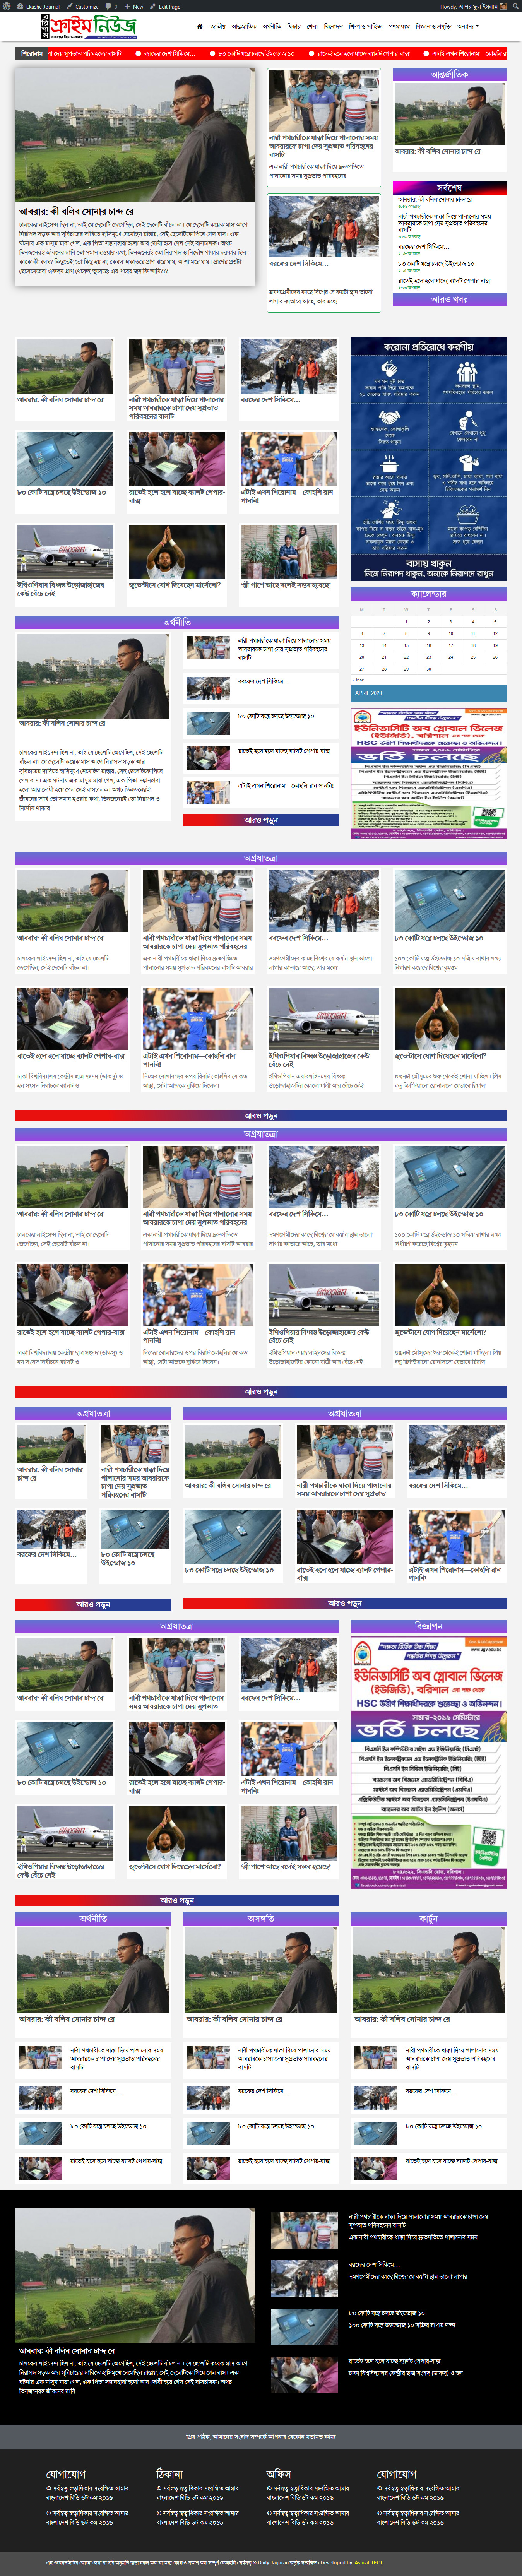 WordPress News Theme (Fresh News)